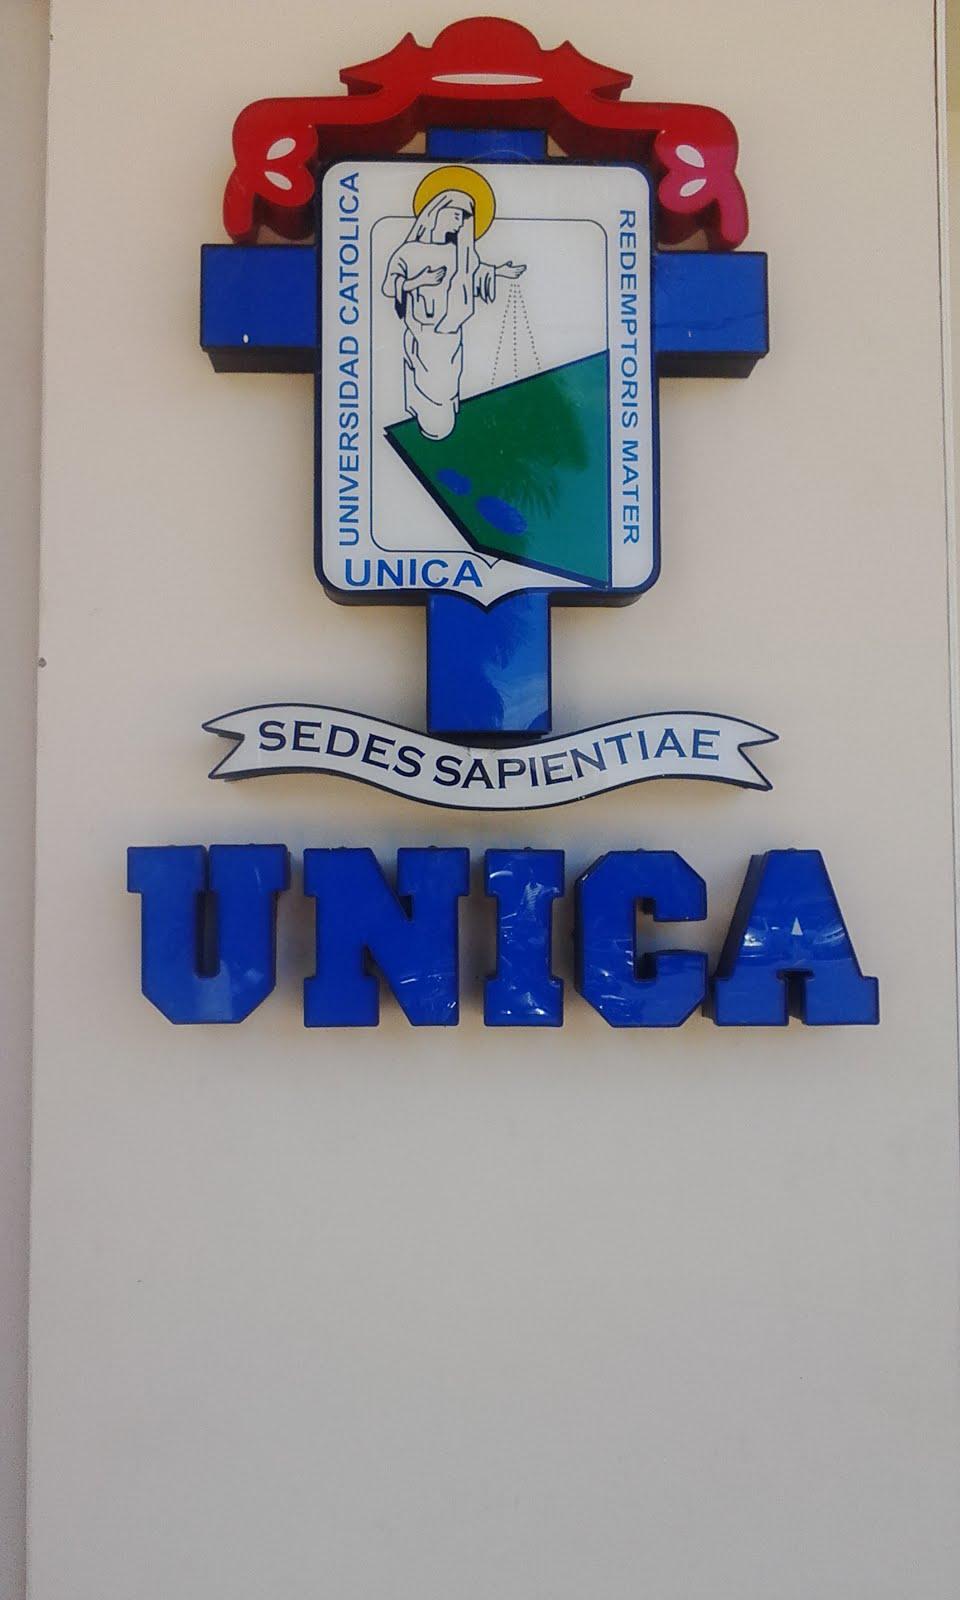 Orgulloso de ser egresado de UNICA.